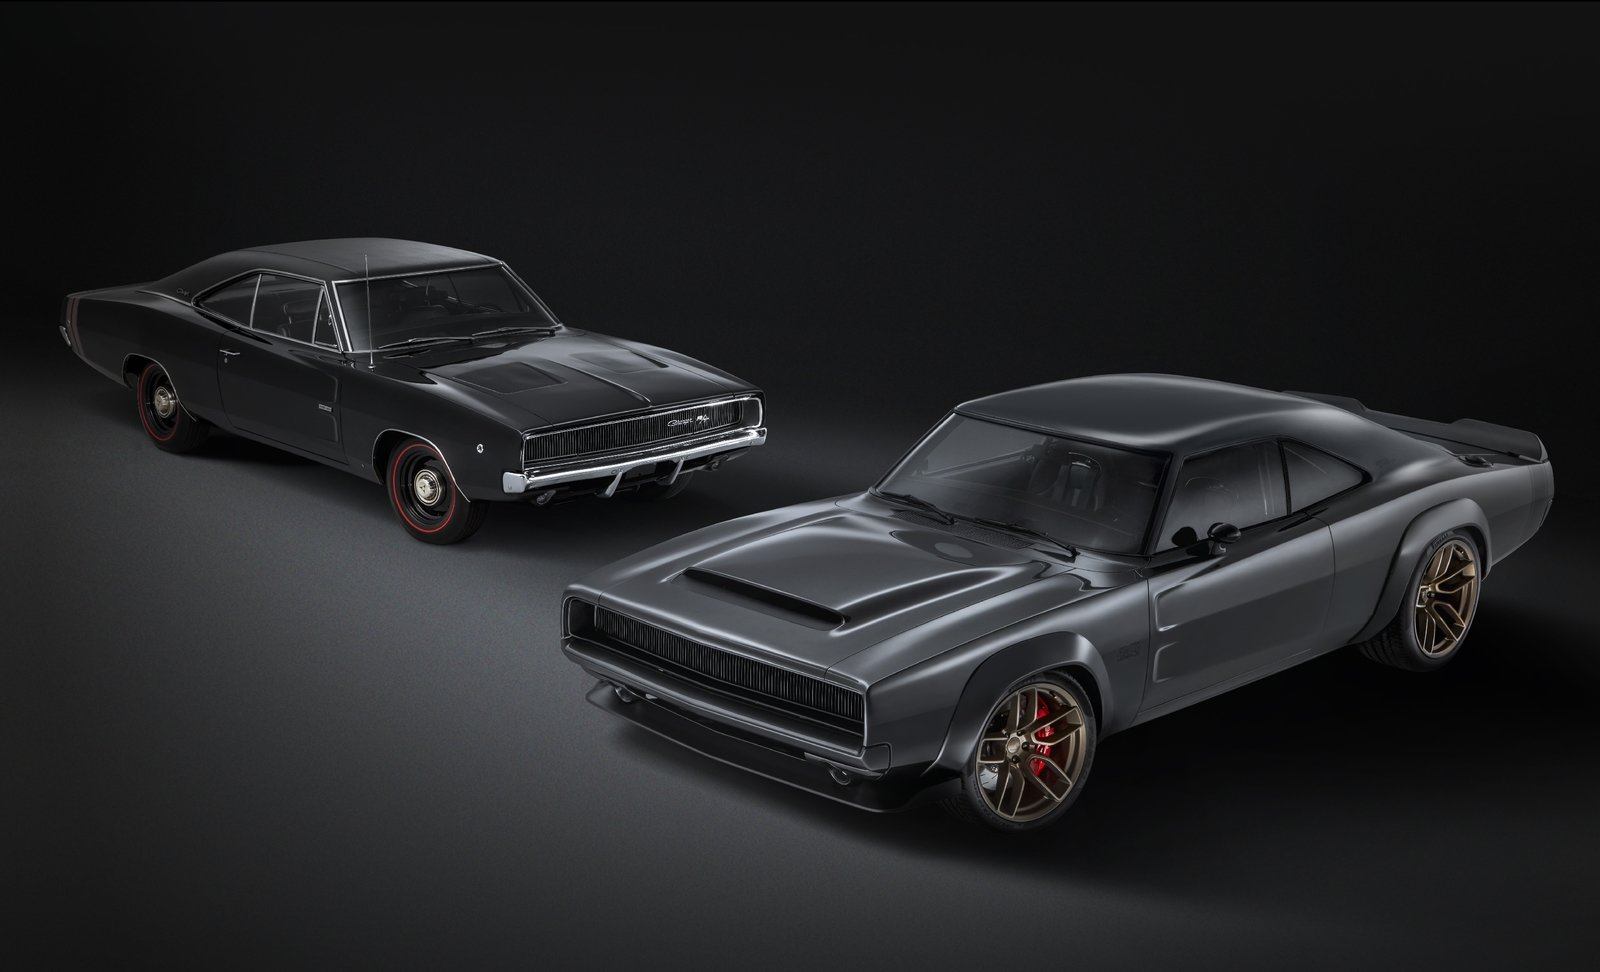 1968 Dodge Charger Wallpaper Cars Mopar Drops 1 000 Horsepower Crate Engine Bombshell At